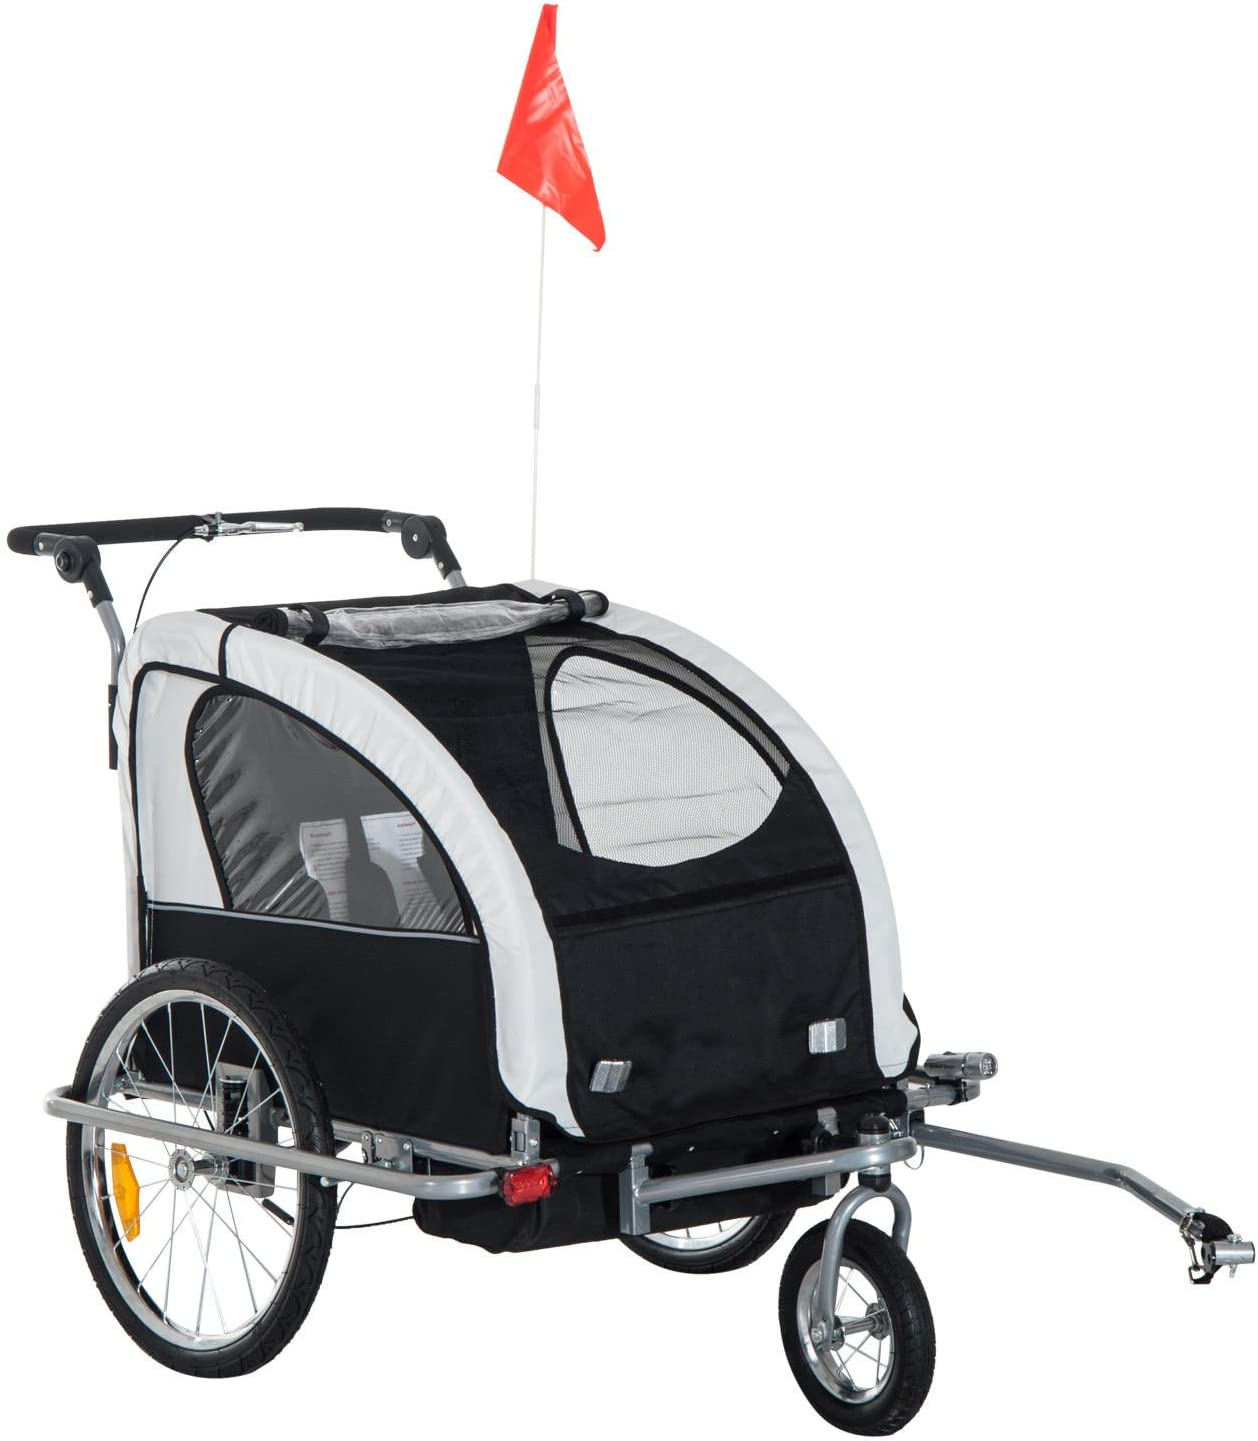 HOMCOM 2 in 1 Multifunctional Bicycle Child Carrier Baby Trailer Stroller Jogger Kit in Steel Frame